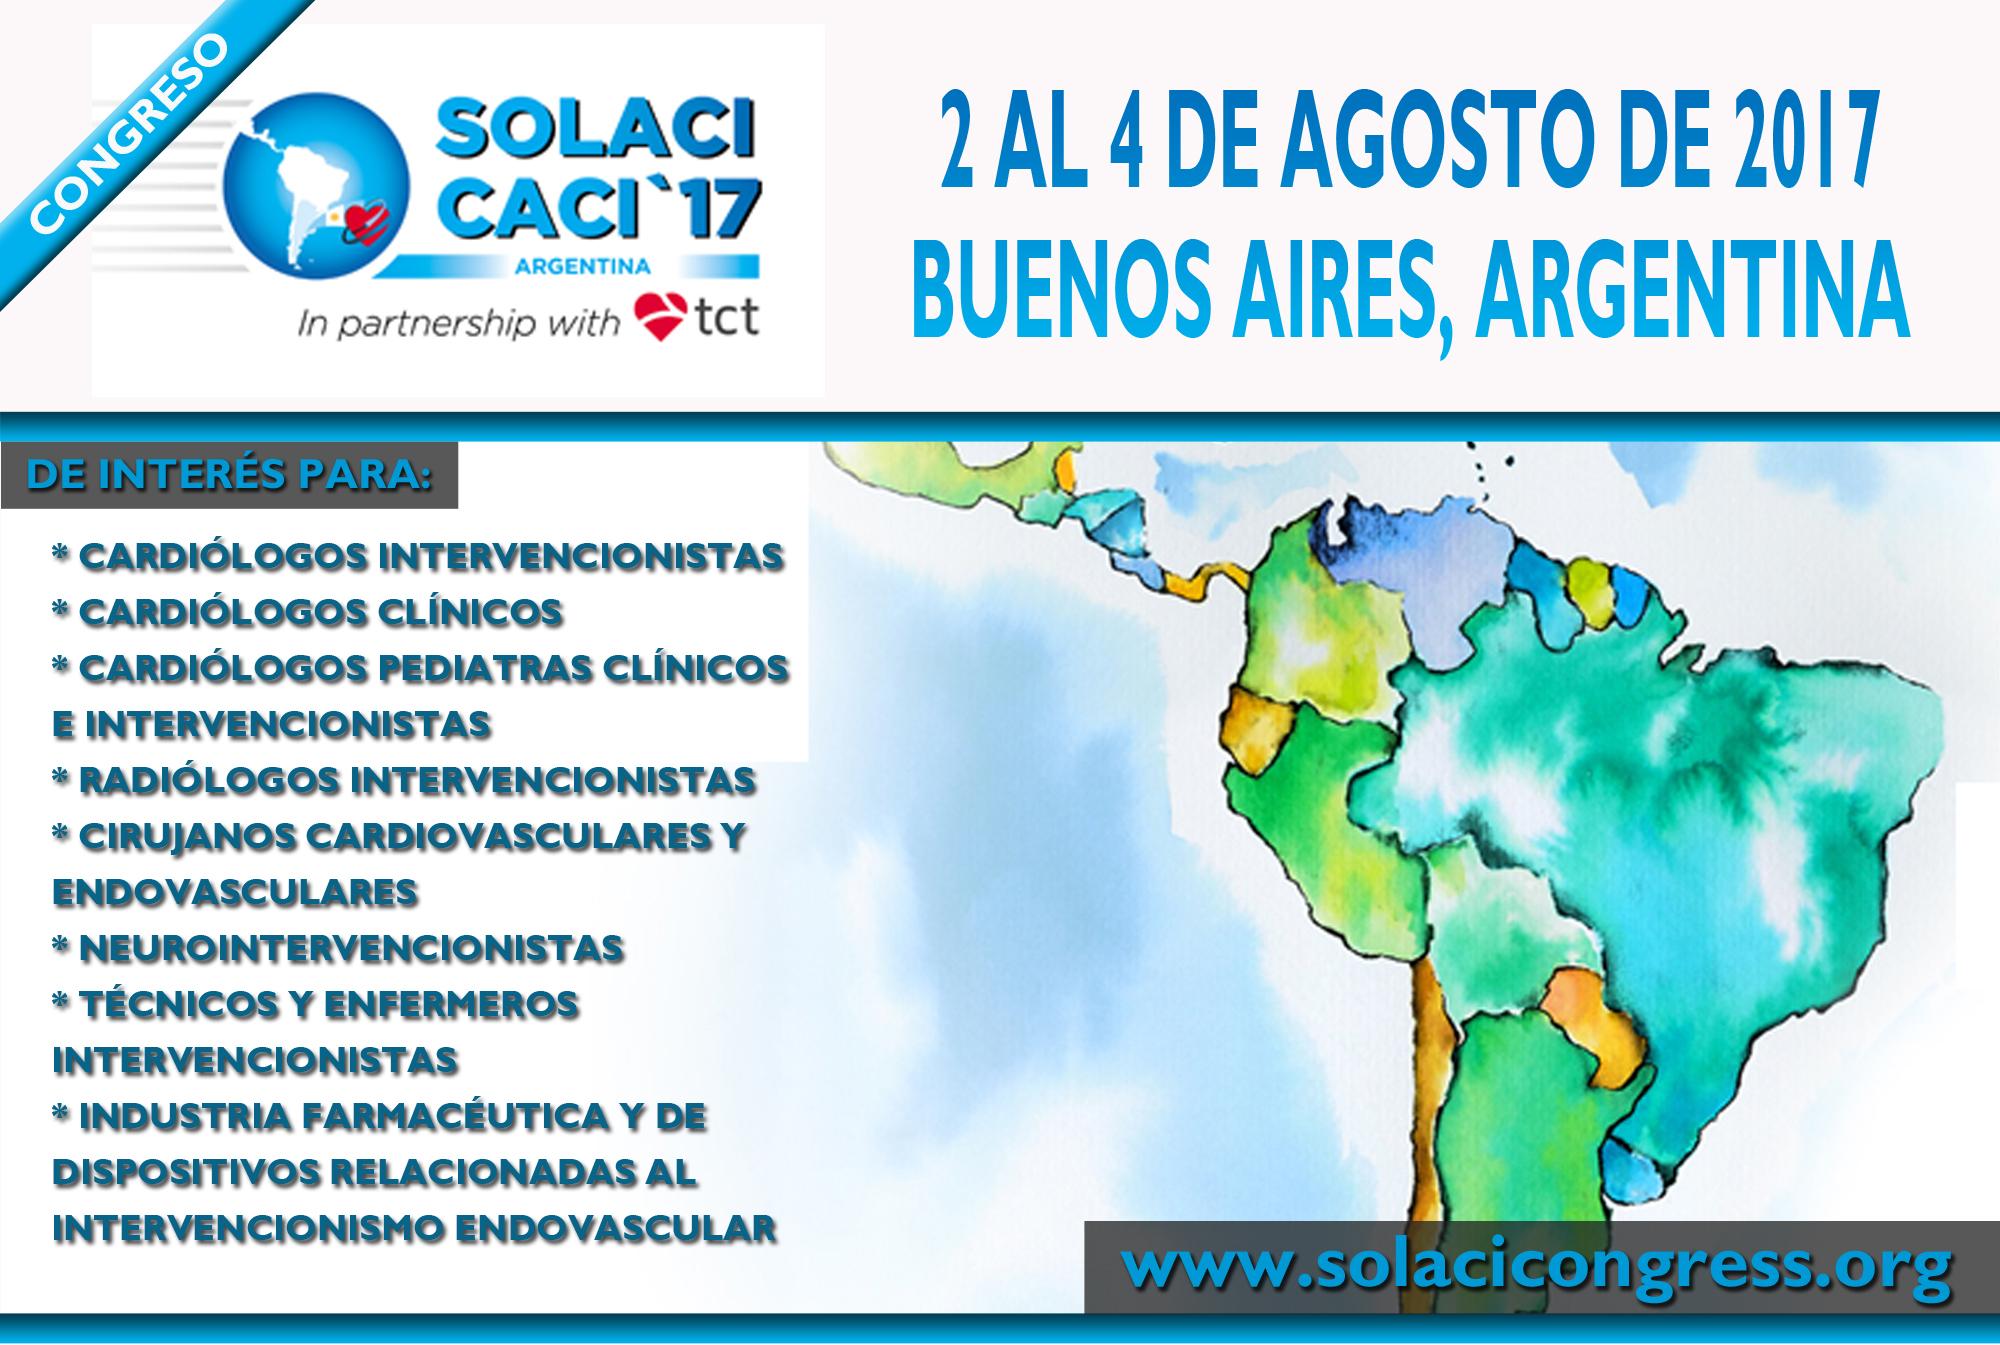 SOLACI-CACI 2017 - Highlights